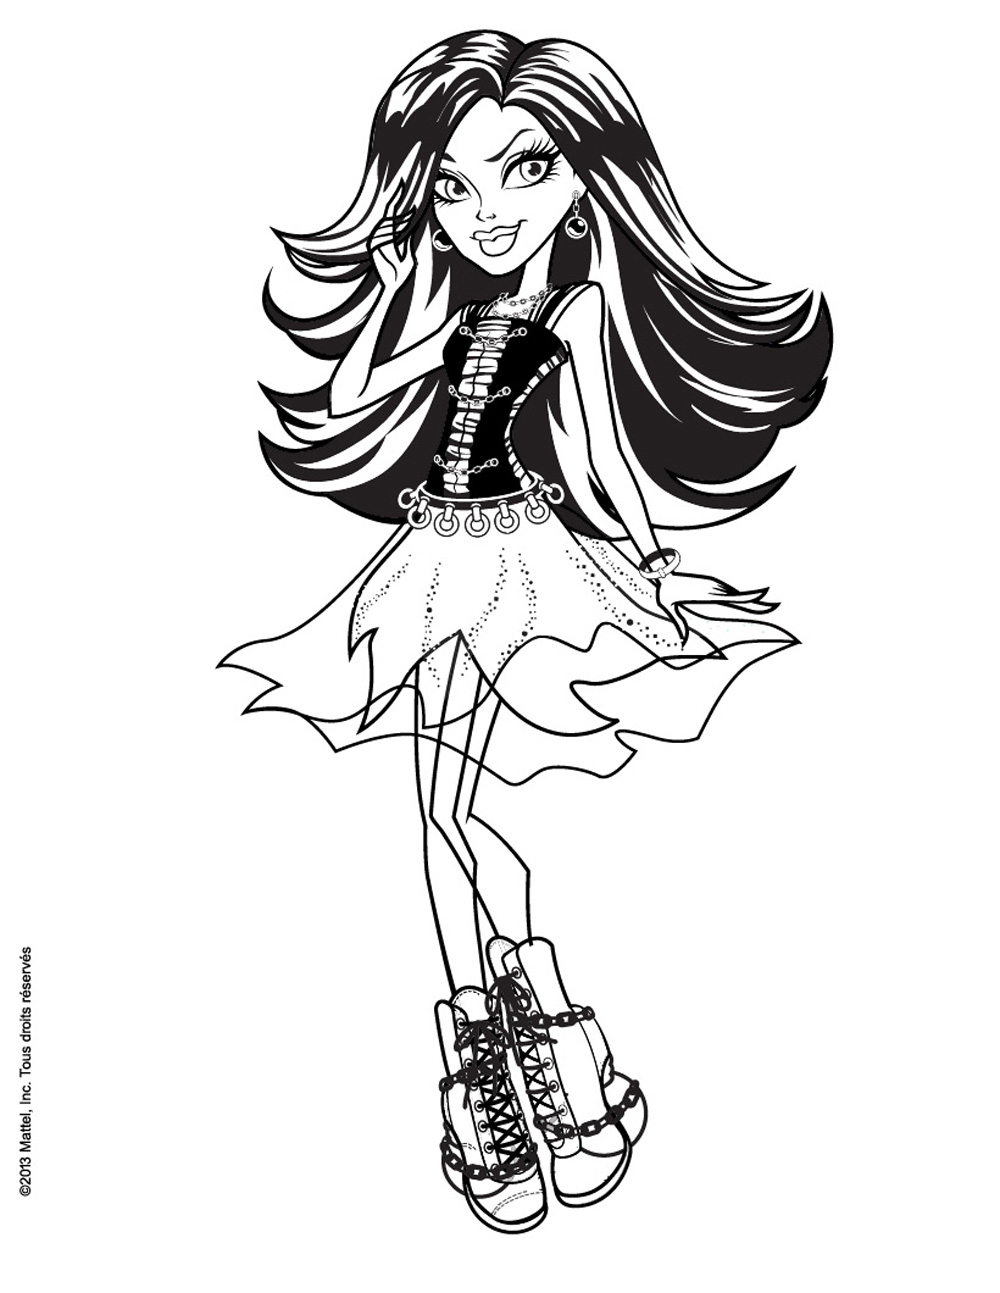 Belle Jeux De Coloriage De Monster High | Imprimer Et dedans Dessin A Imprimer Monster High